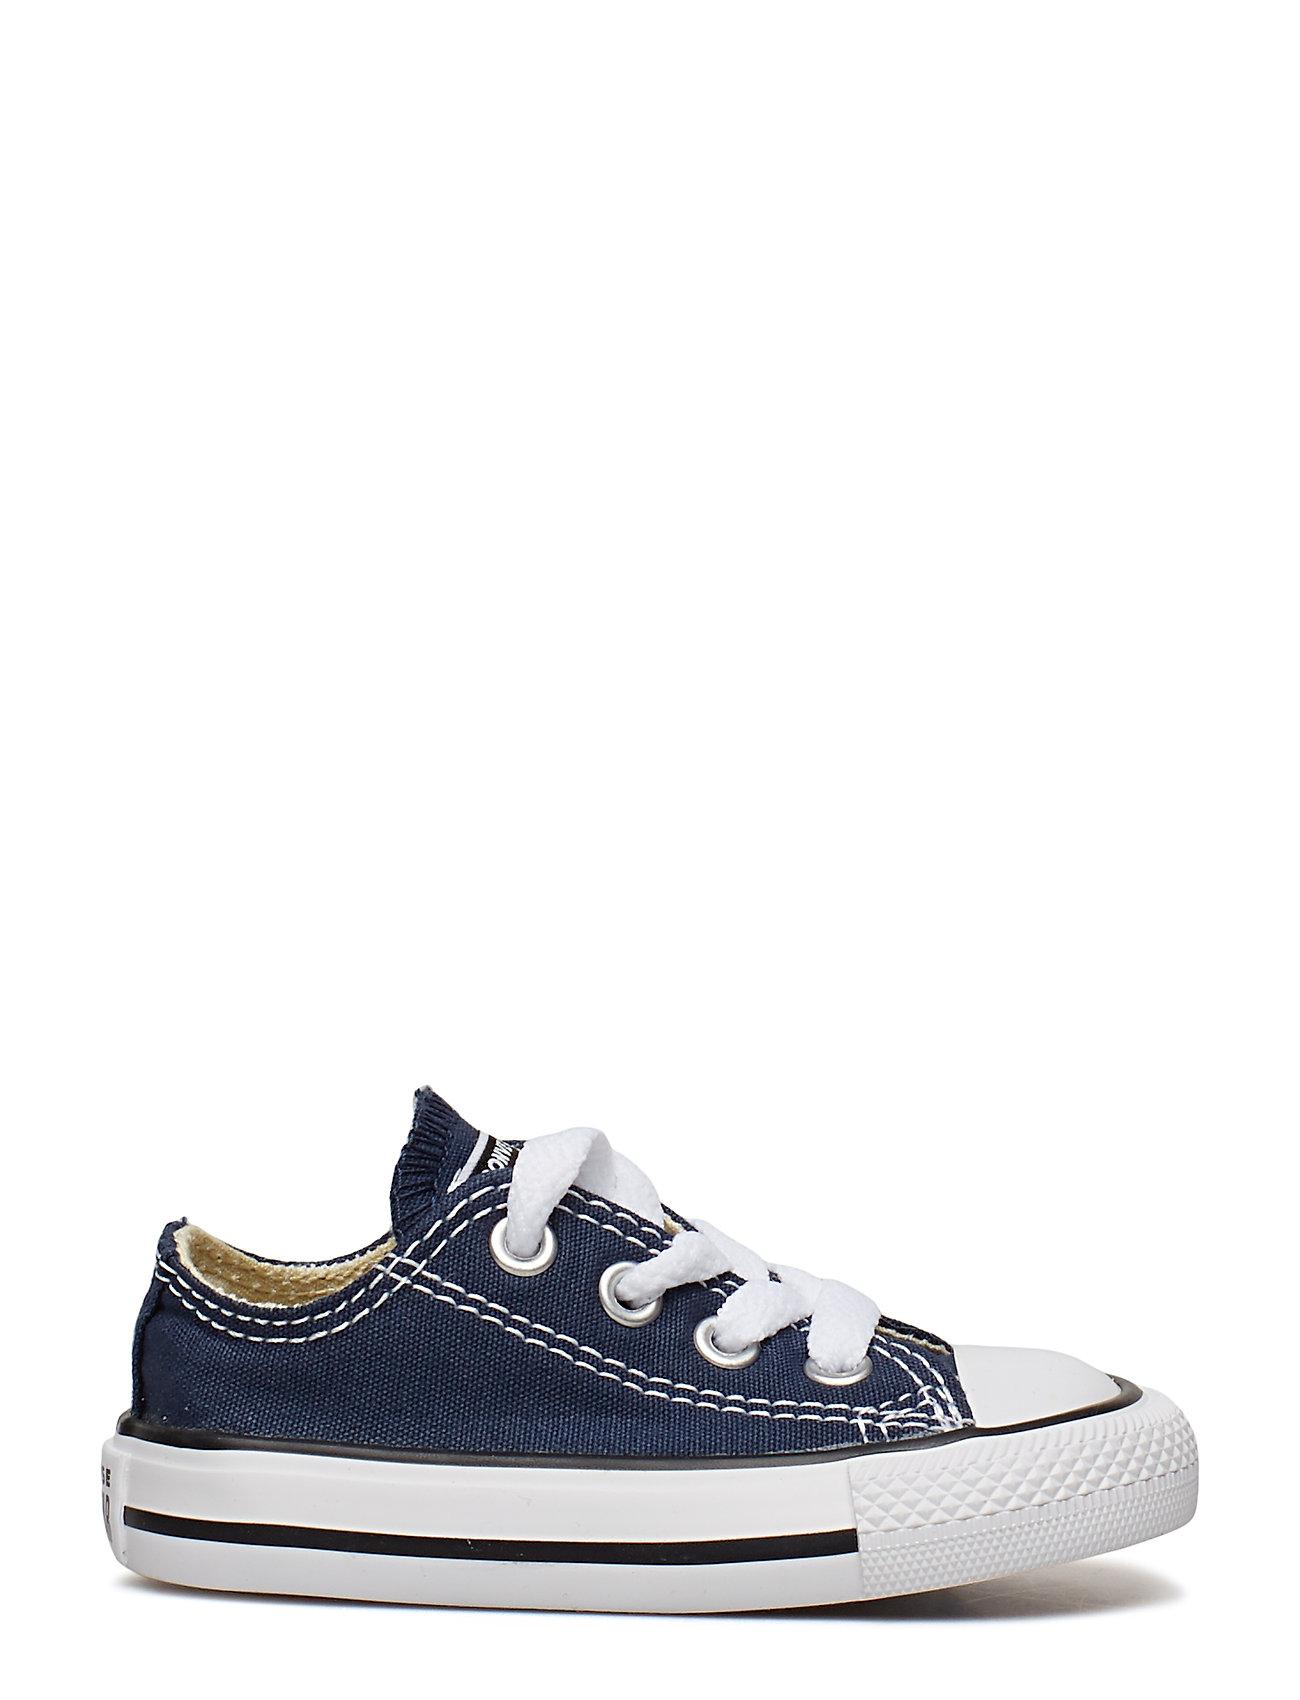 Inf C/T A/S Ox Sneakers Sko Blå Converse